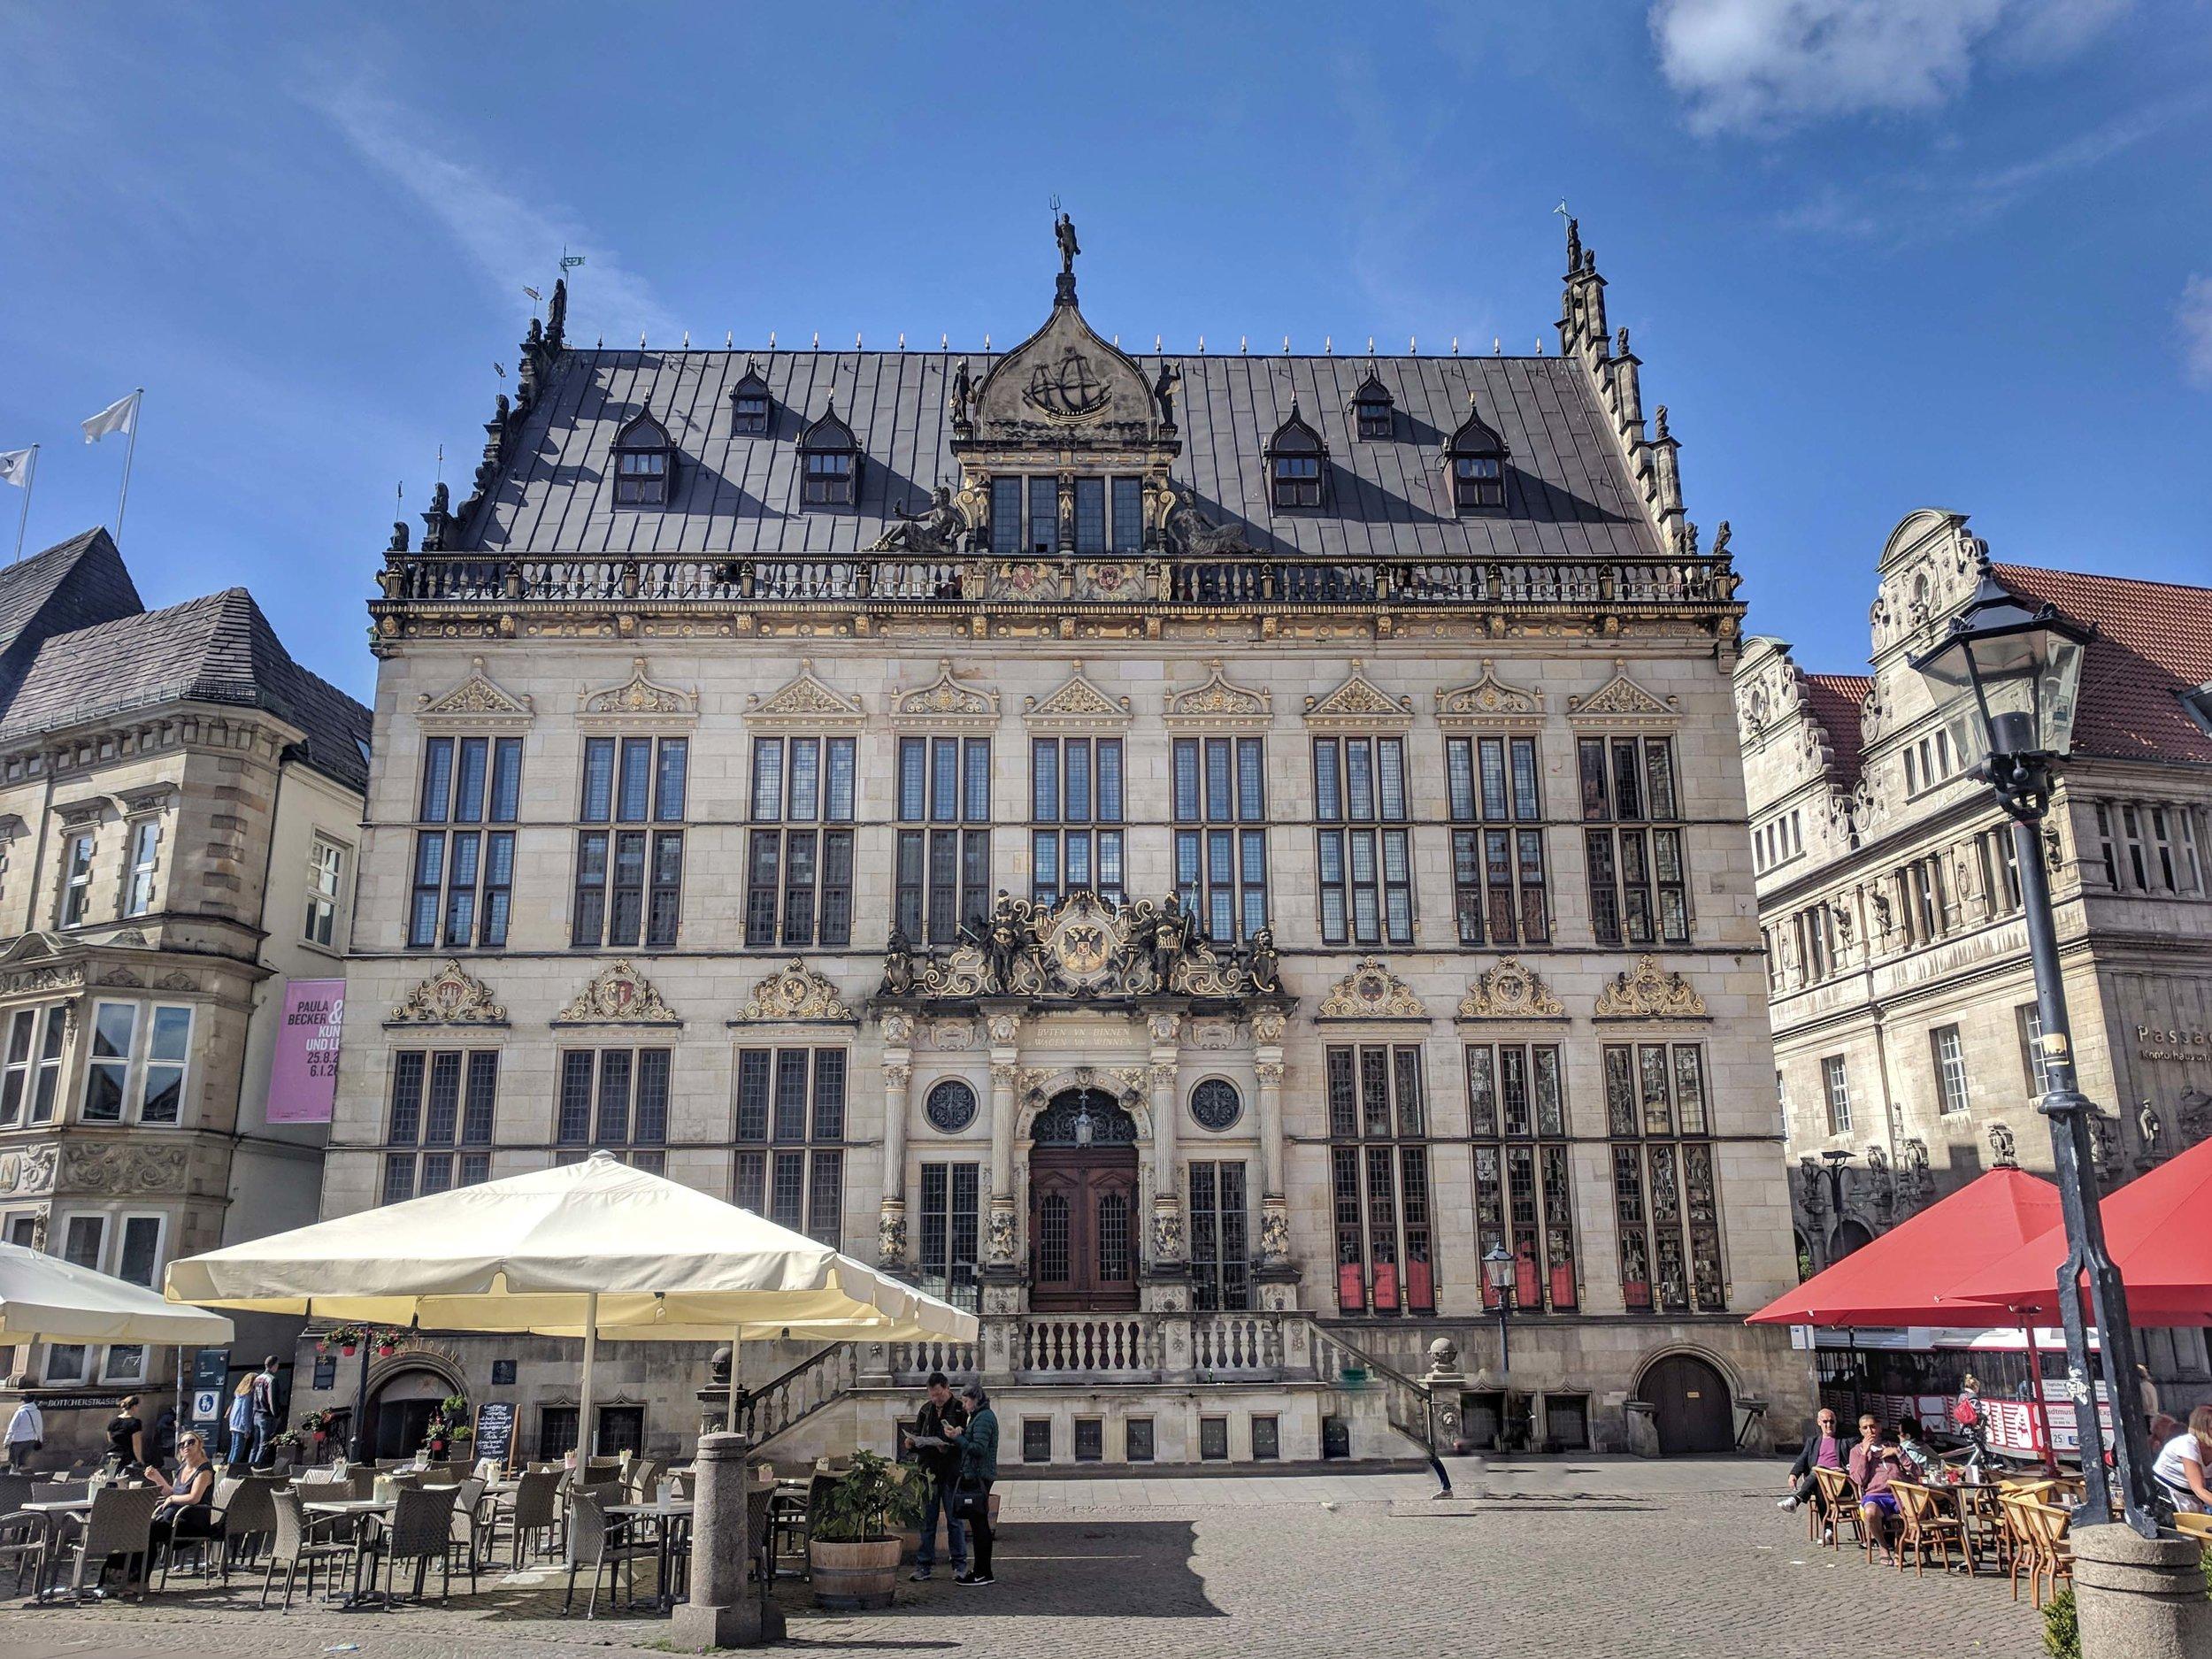 More stunning architecture of Marktplatz